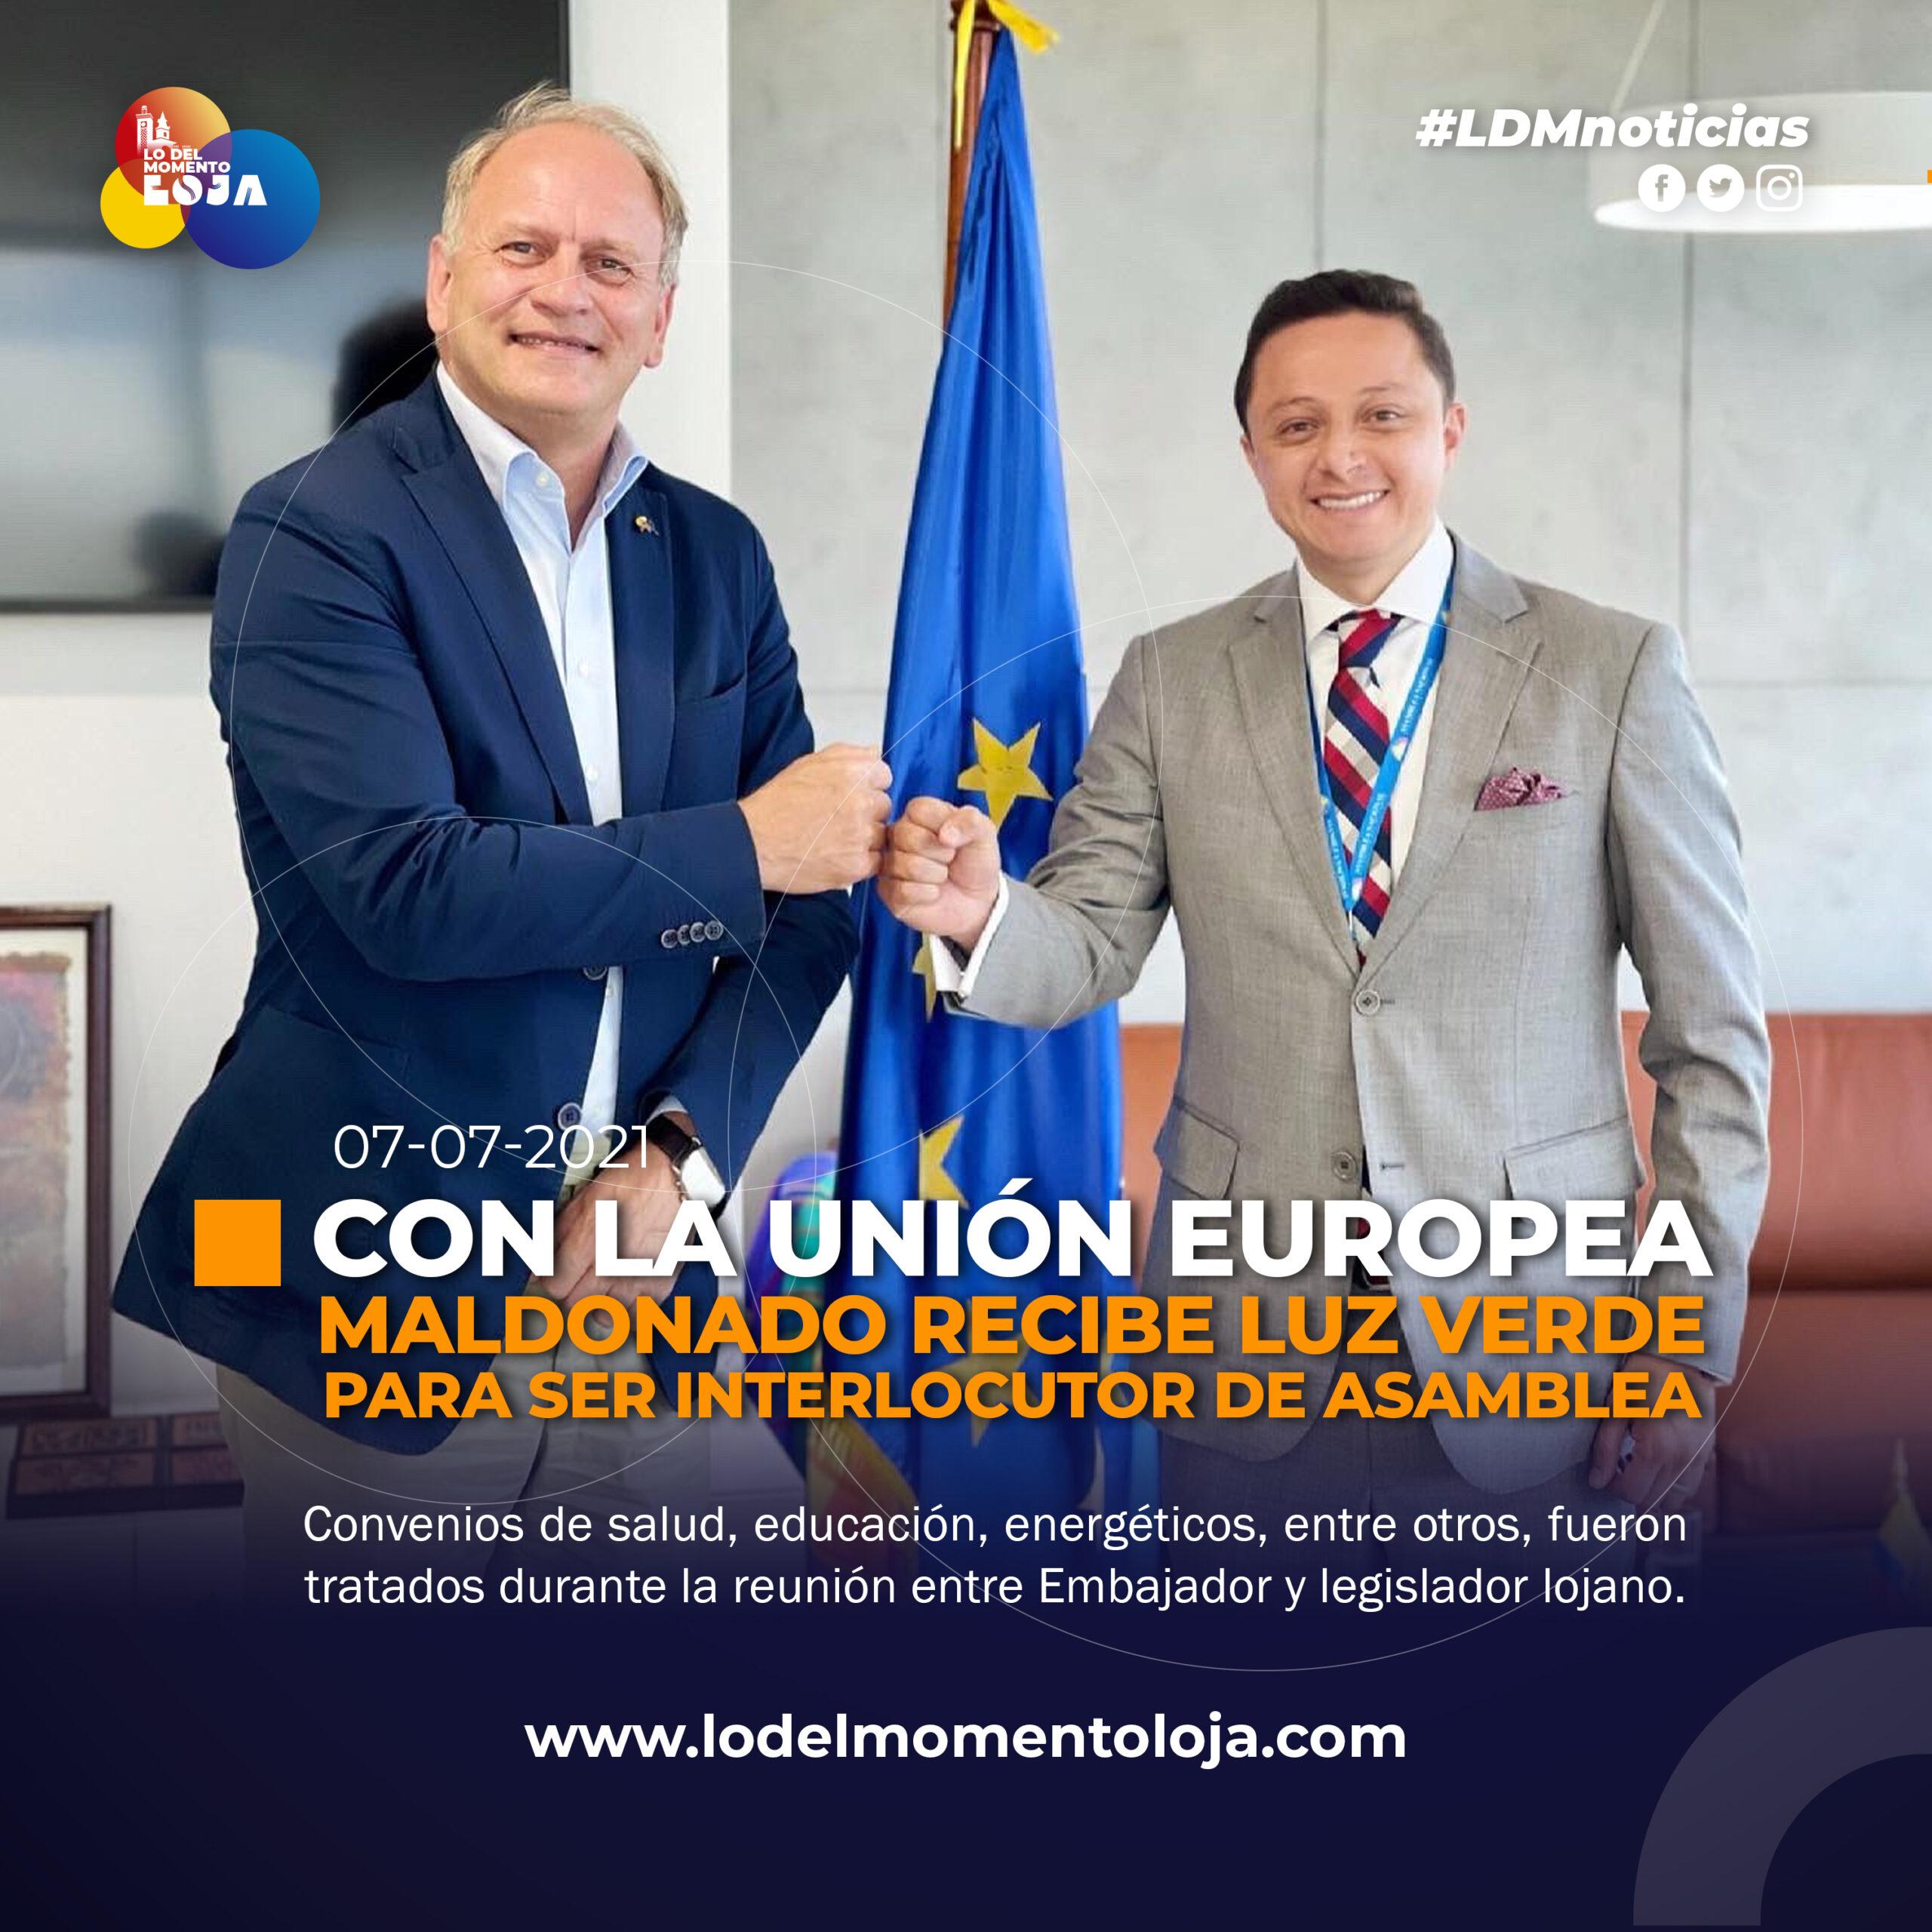 Asambleísta genera espacios de cooperación con la Unión Europea.